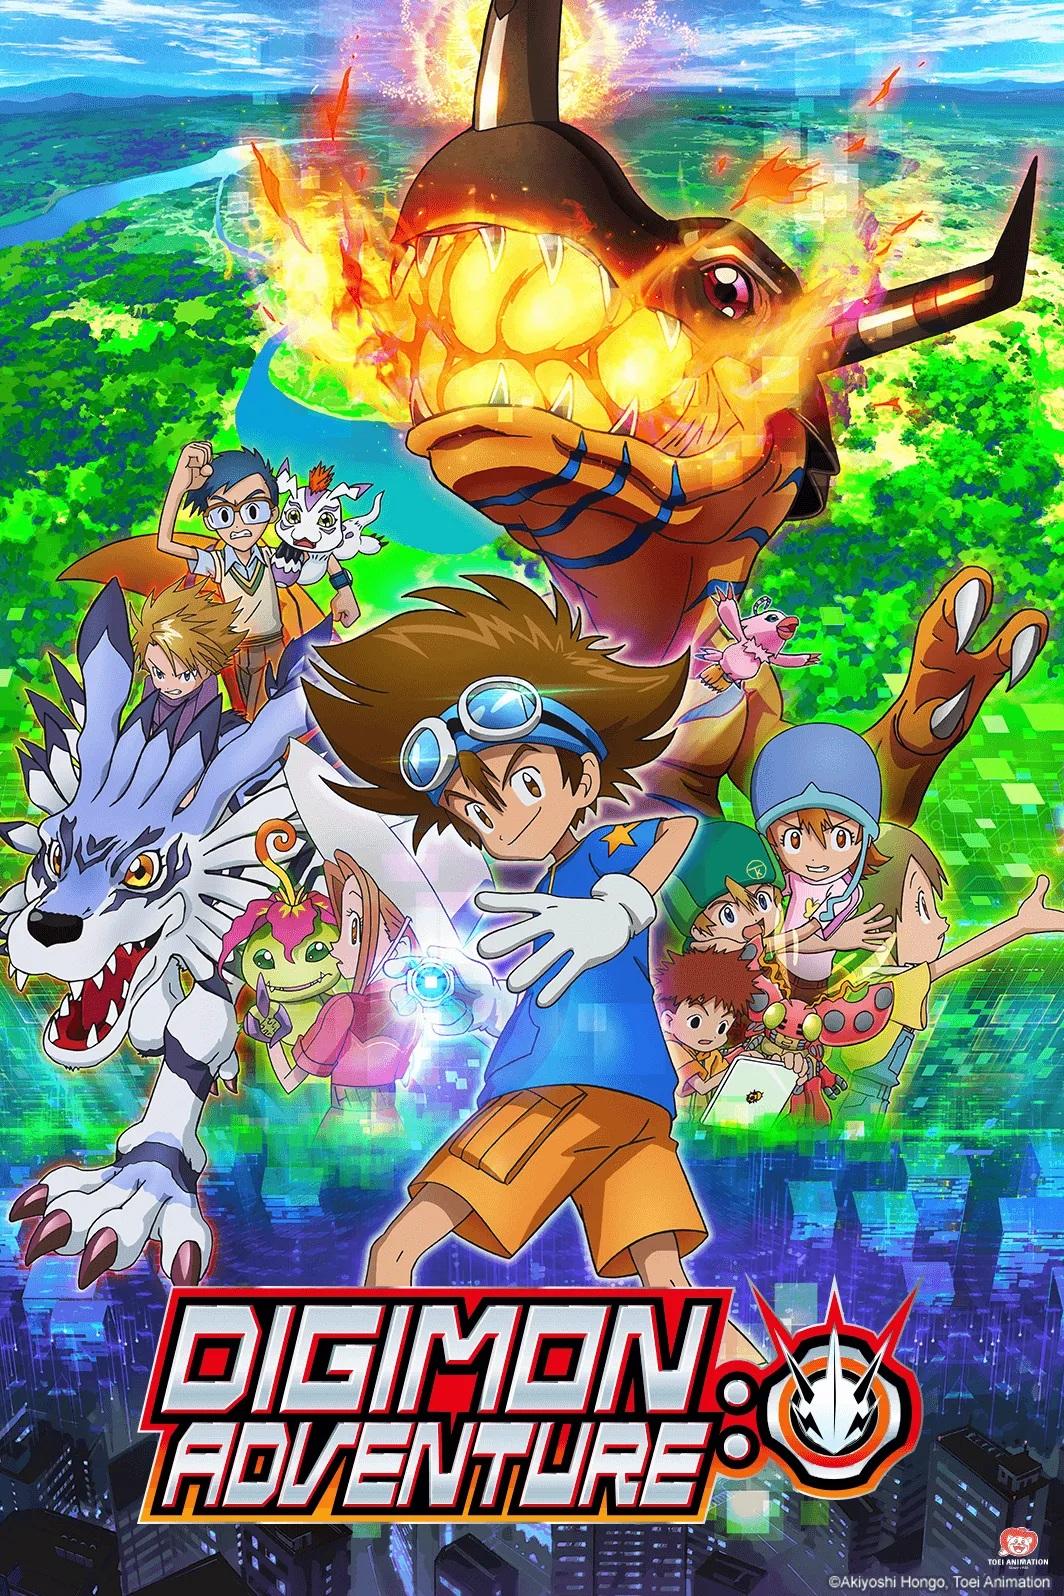 Digimon-Crunchyroll